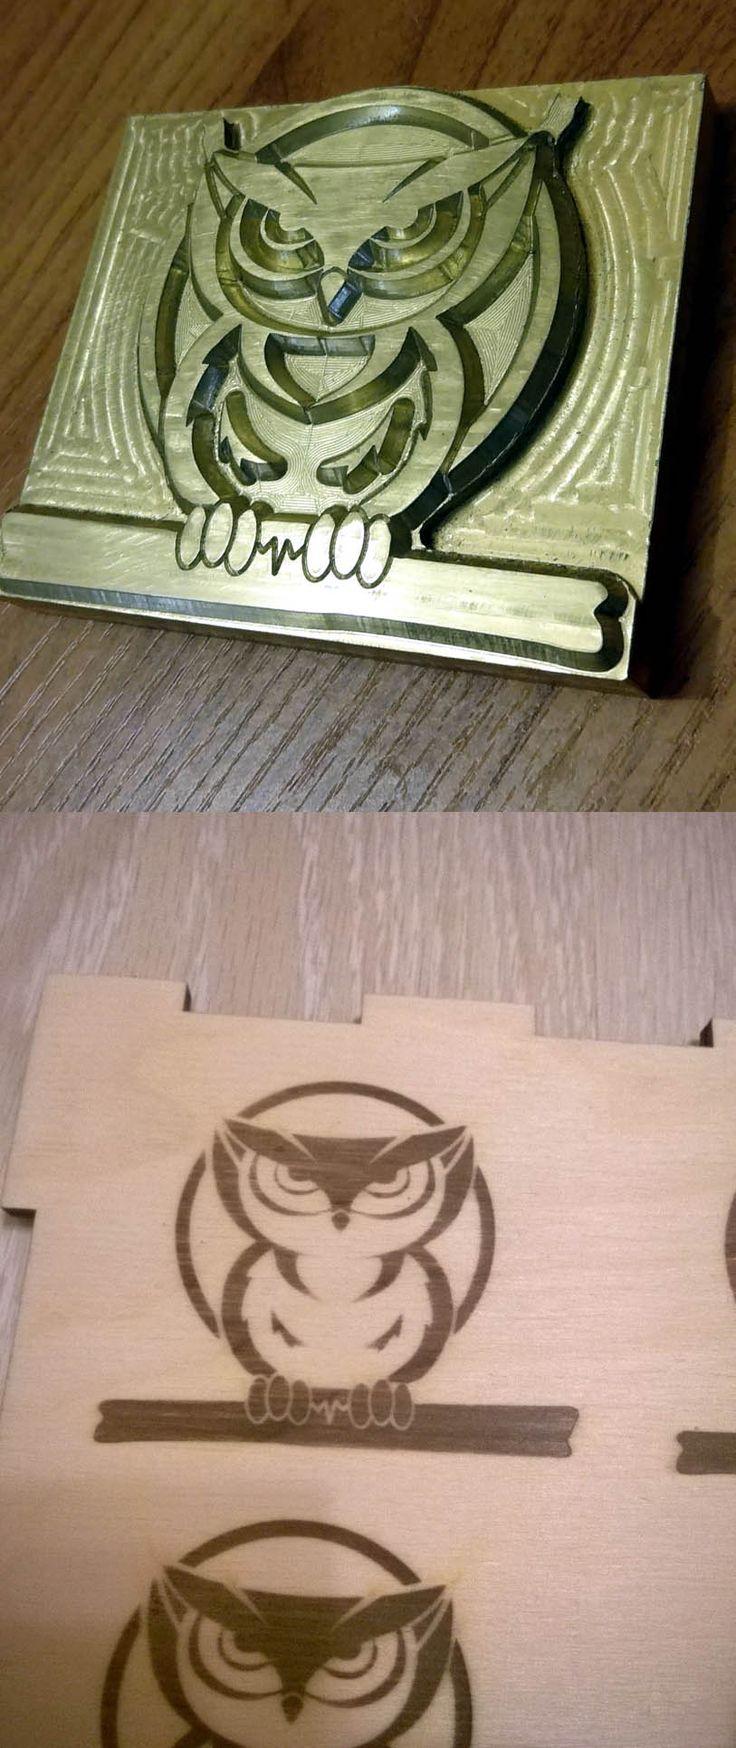 Custom branding iron with 250w leather brass stamp wood